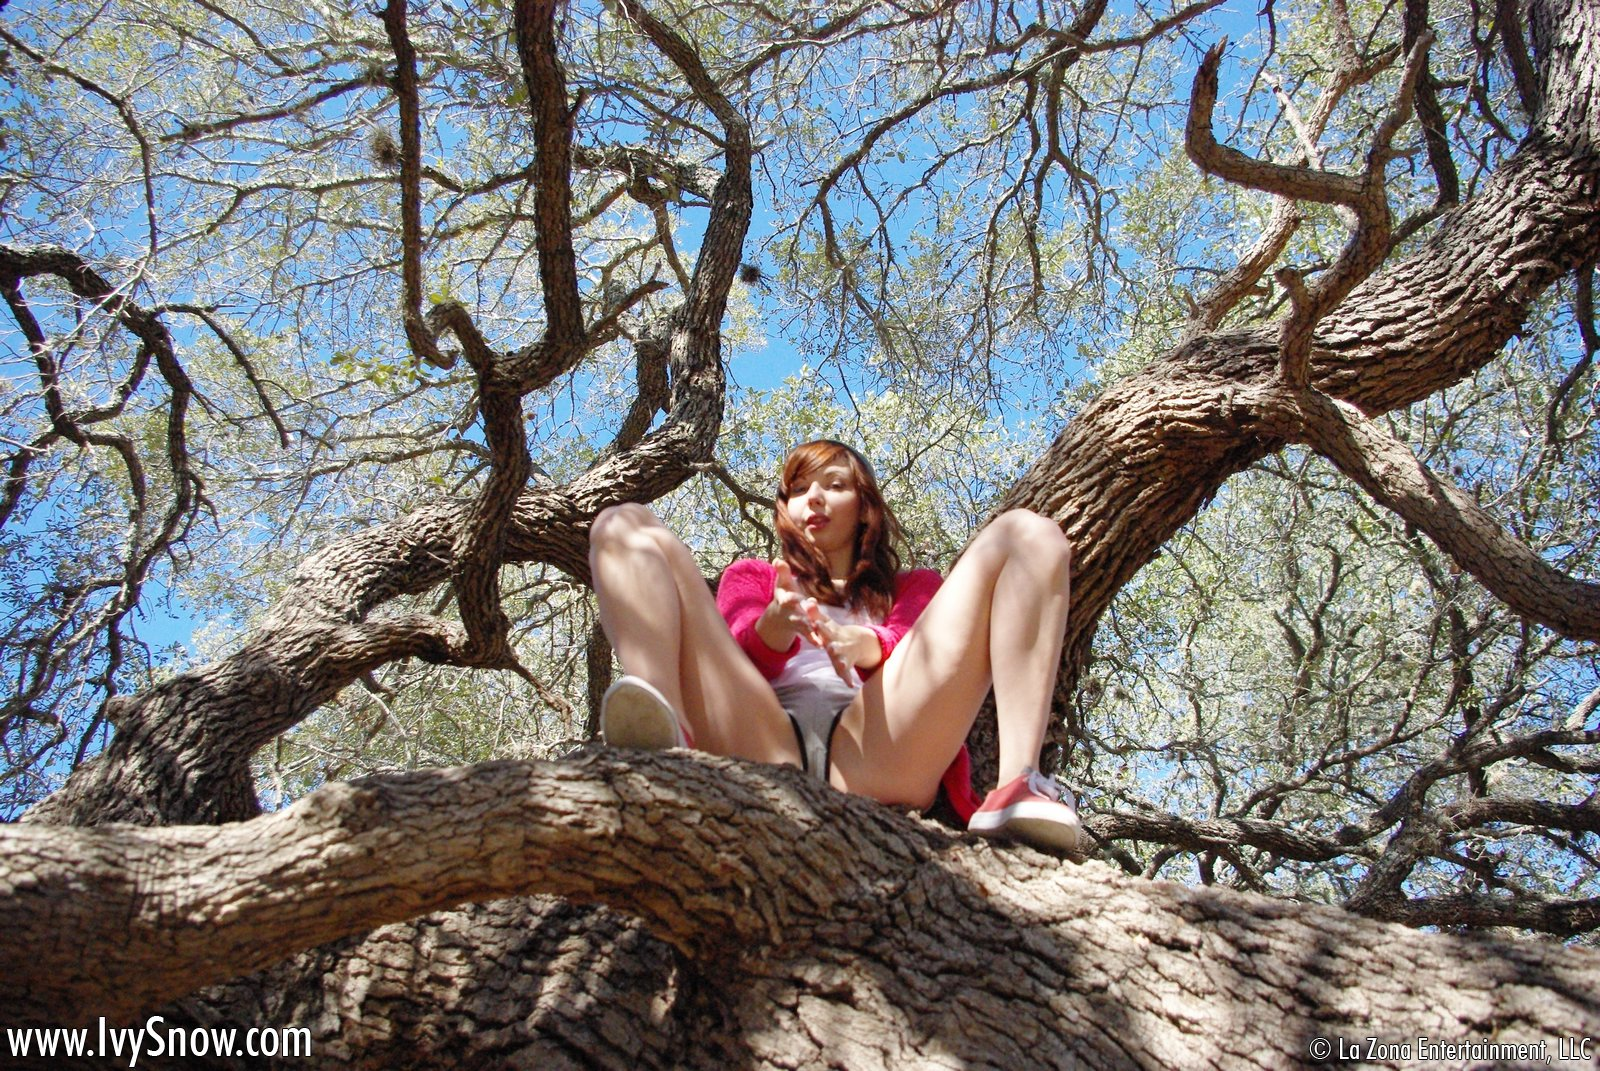 Ivy Snow tree hugger @ GirlzNation.com